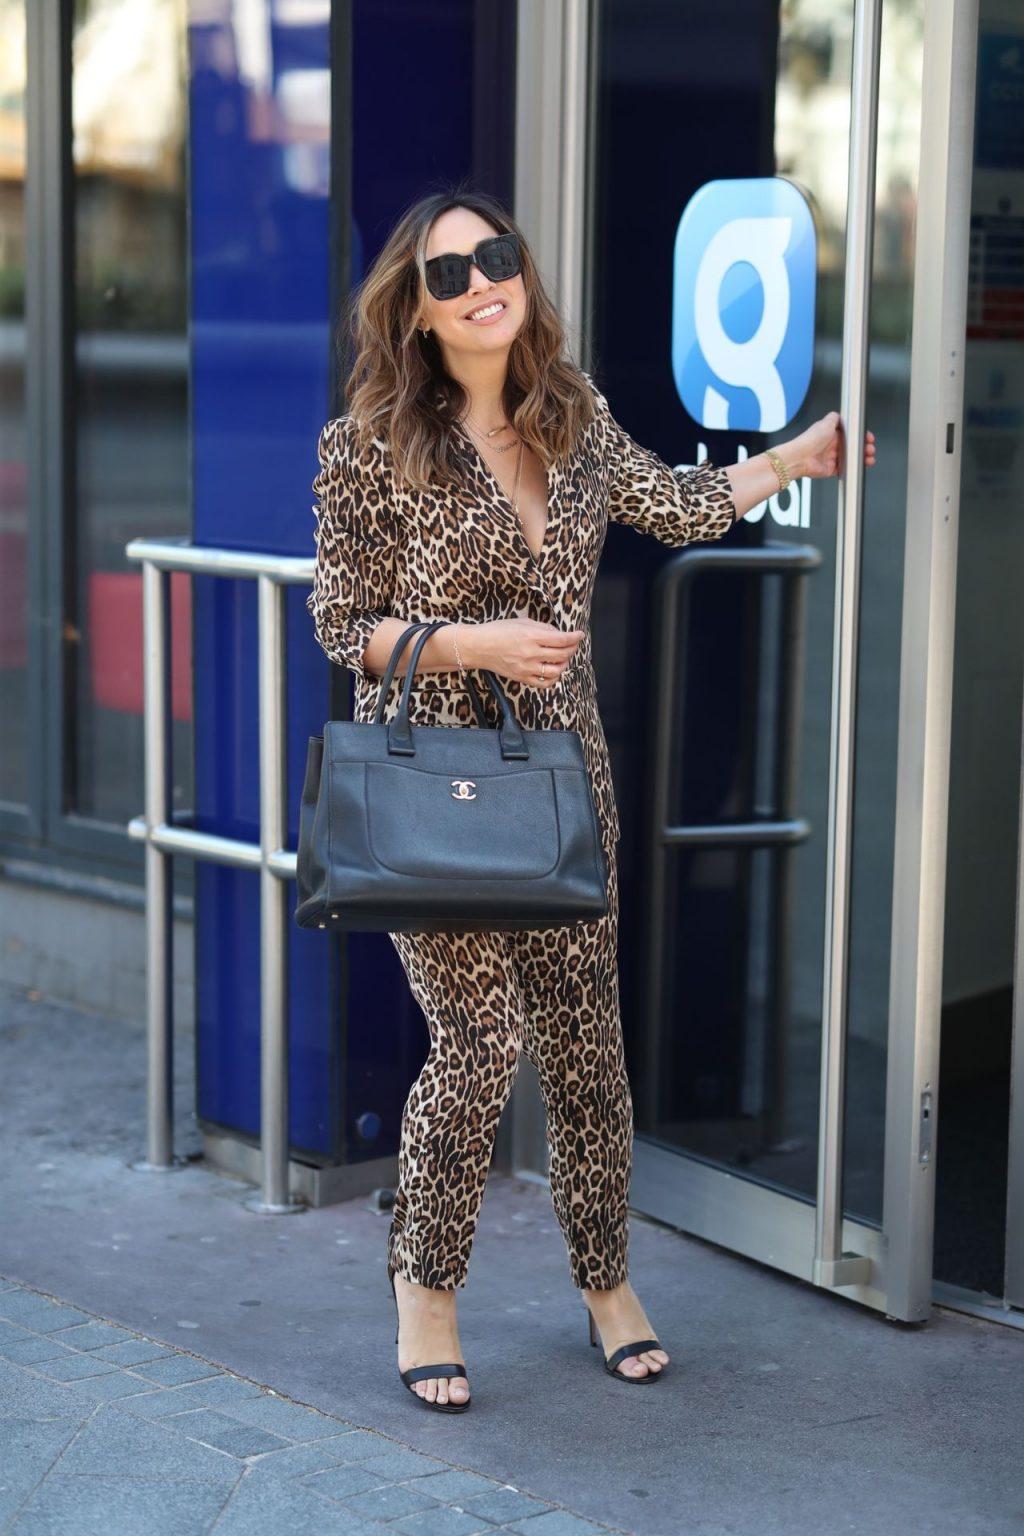 Sexy Singer Myleene Klass Is Pictured Arriving at the Global Studios (16 Photos)